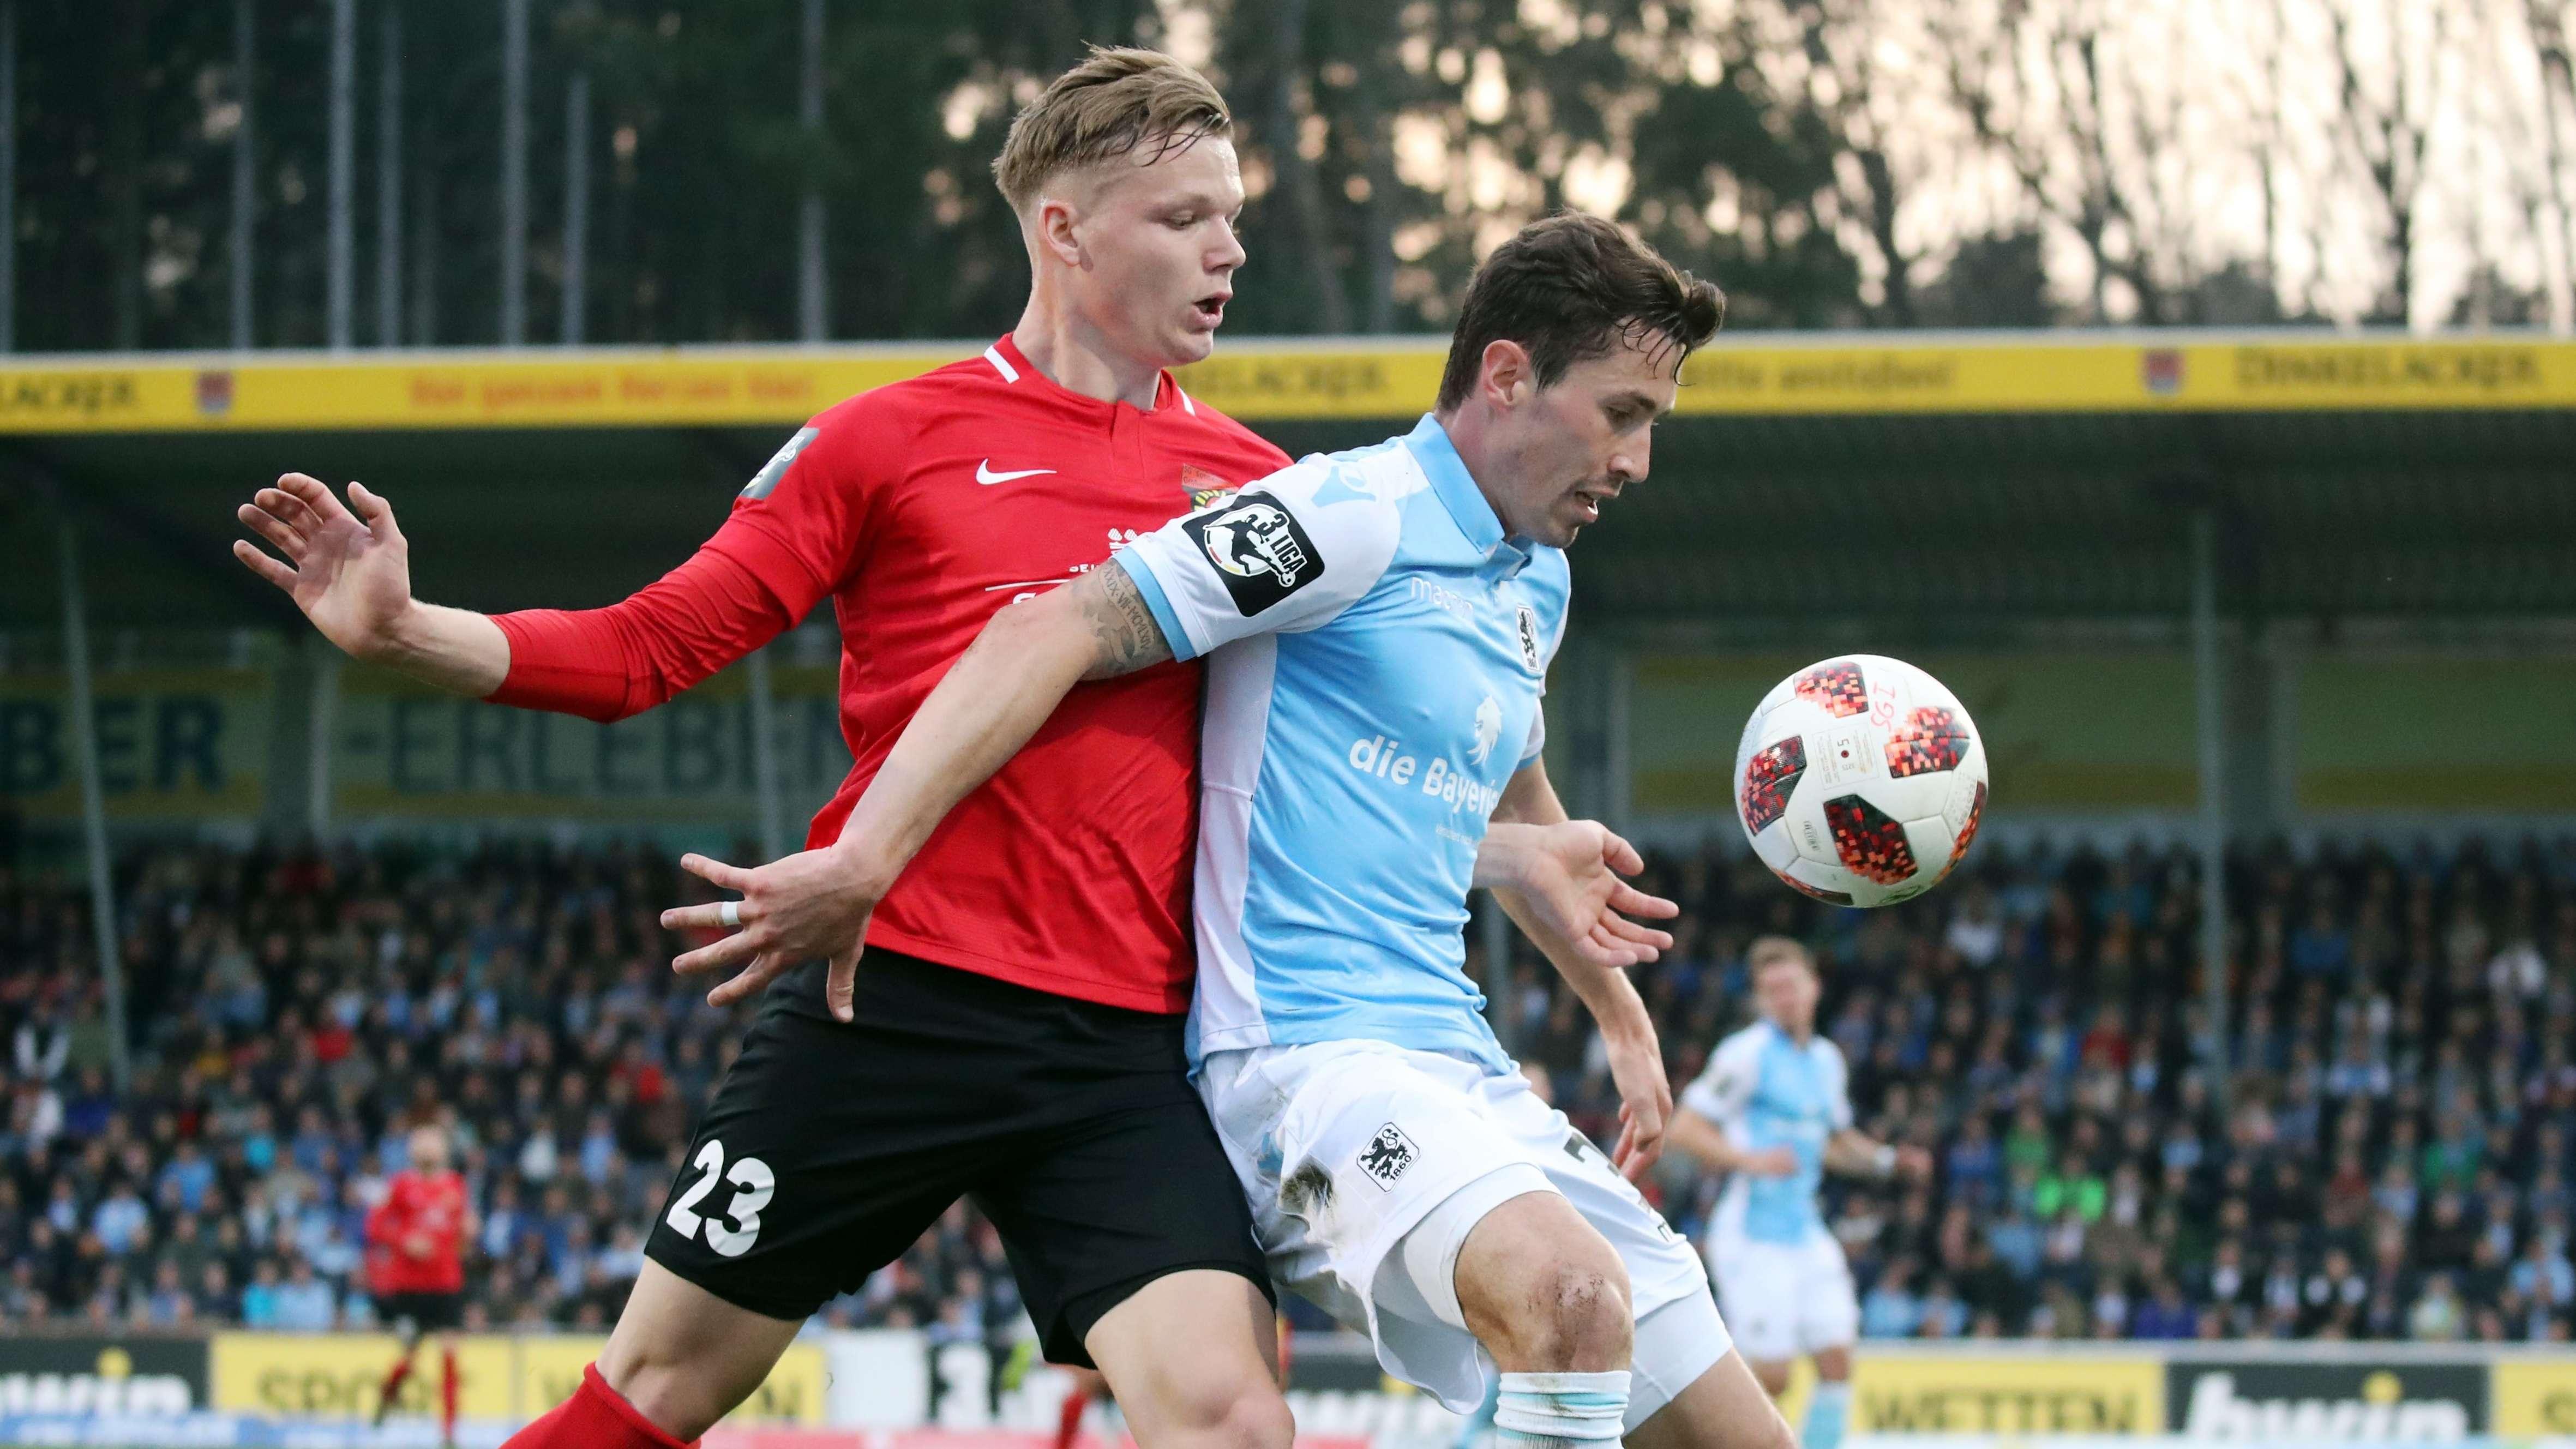 Spielszene SG Sonnenhof Großaspach - TSV 1860 München